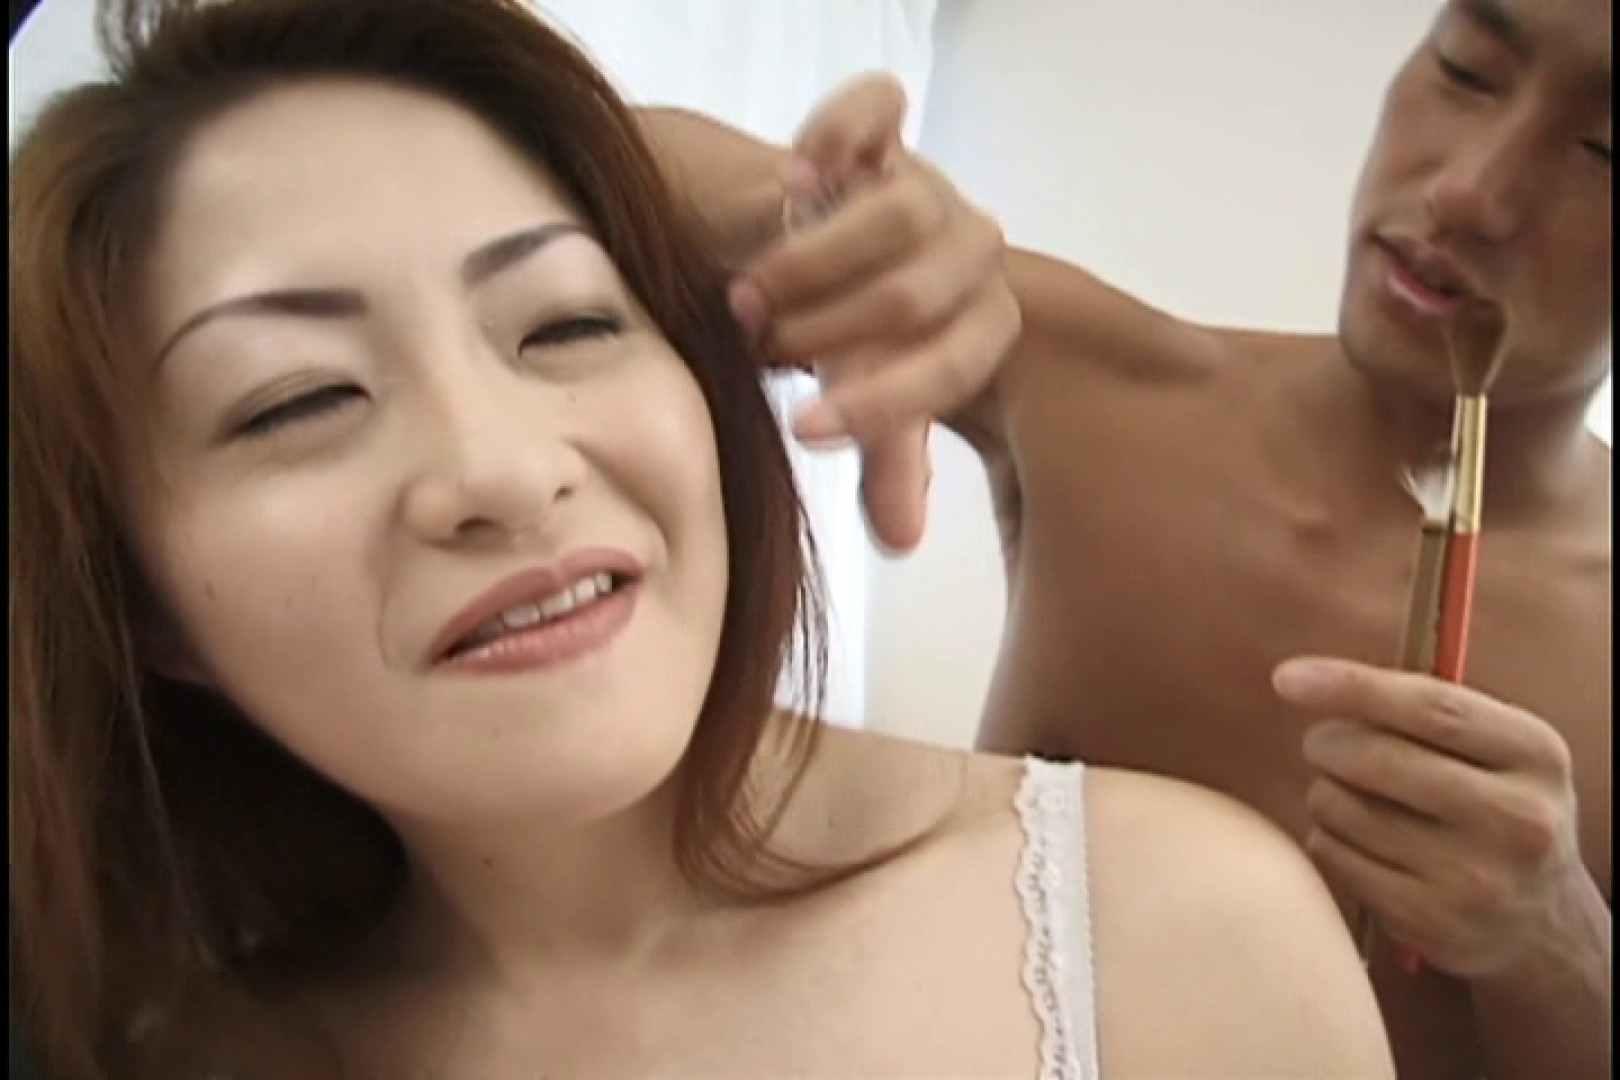 昼間の奥様は欲求不満 ~青井祐子~ 熟女  43連発 26